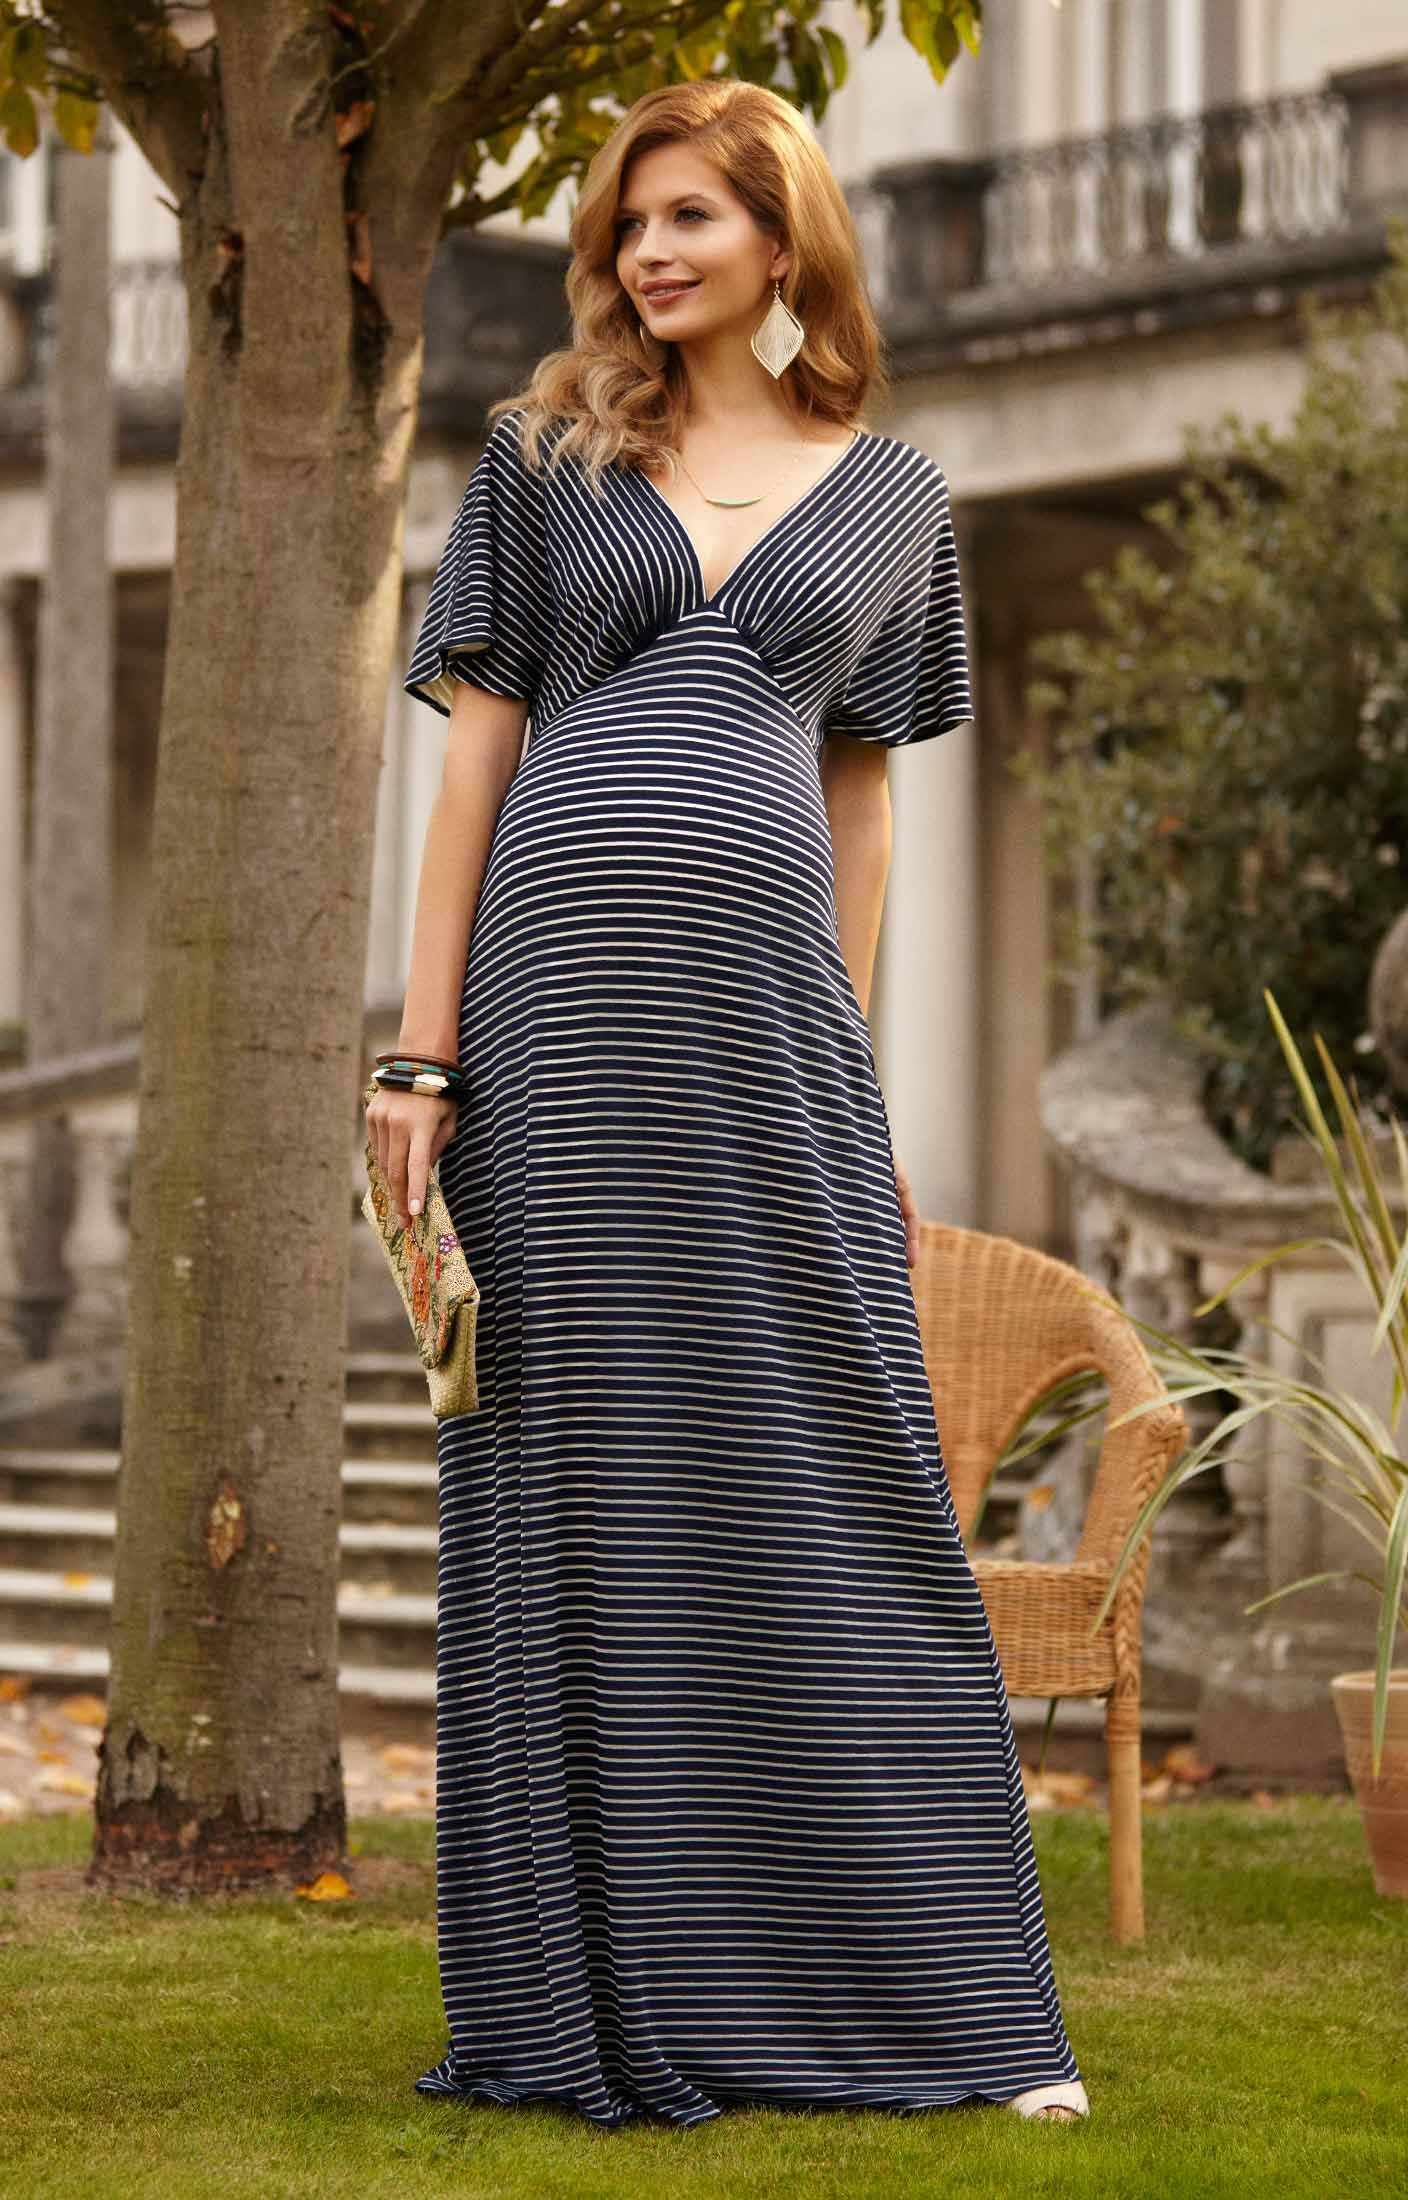 Celia Maxi Dress | Maxi dresses, Maternity maxi and Navy stripes